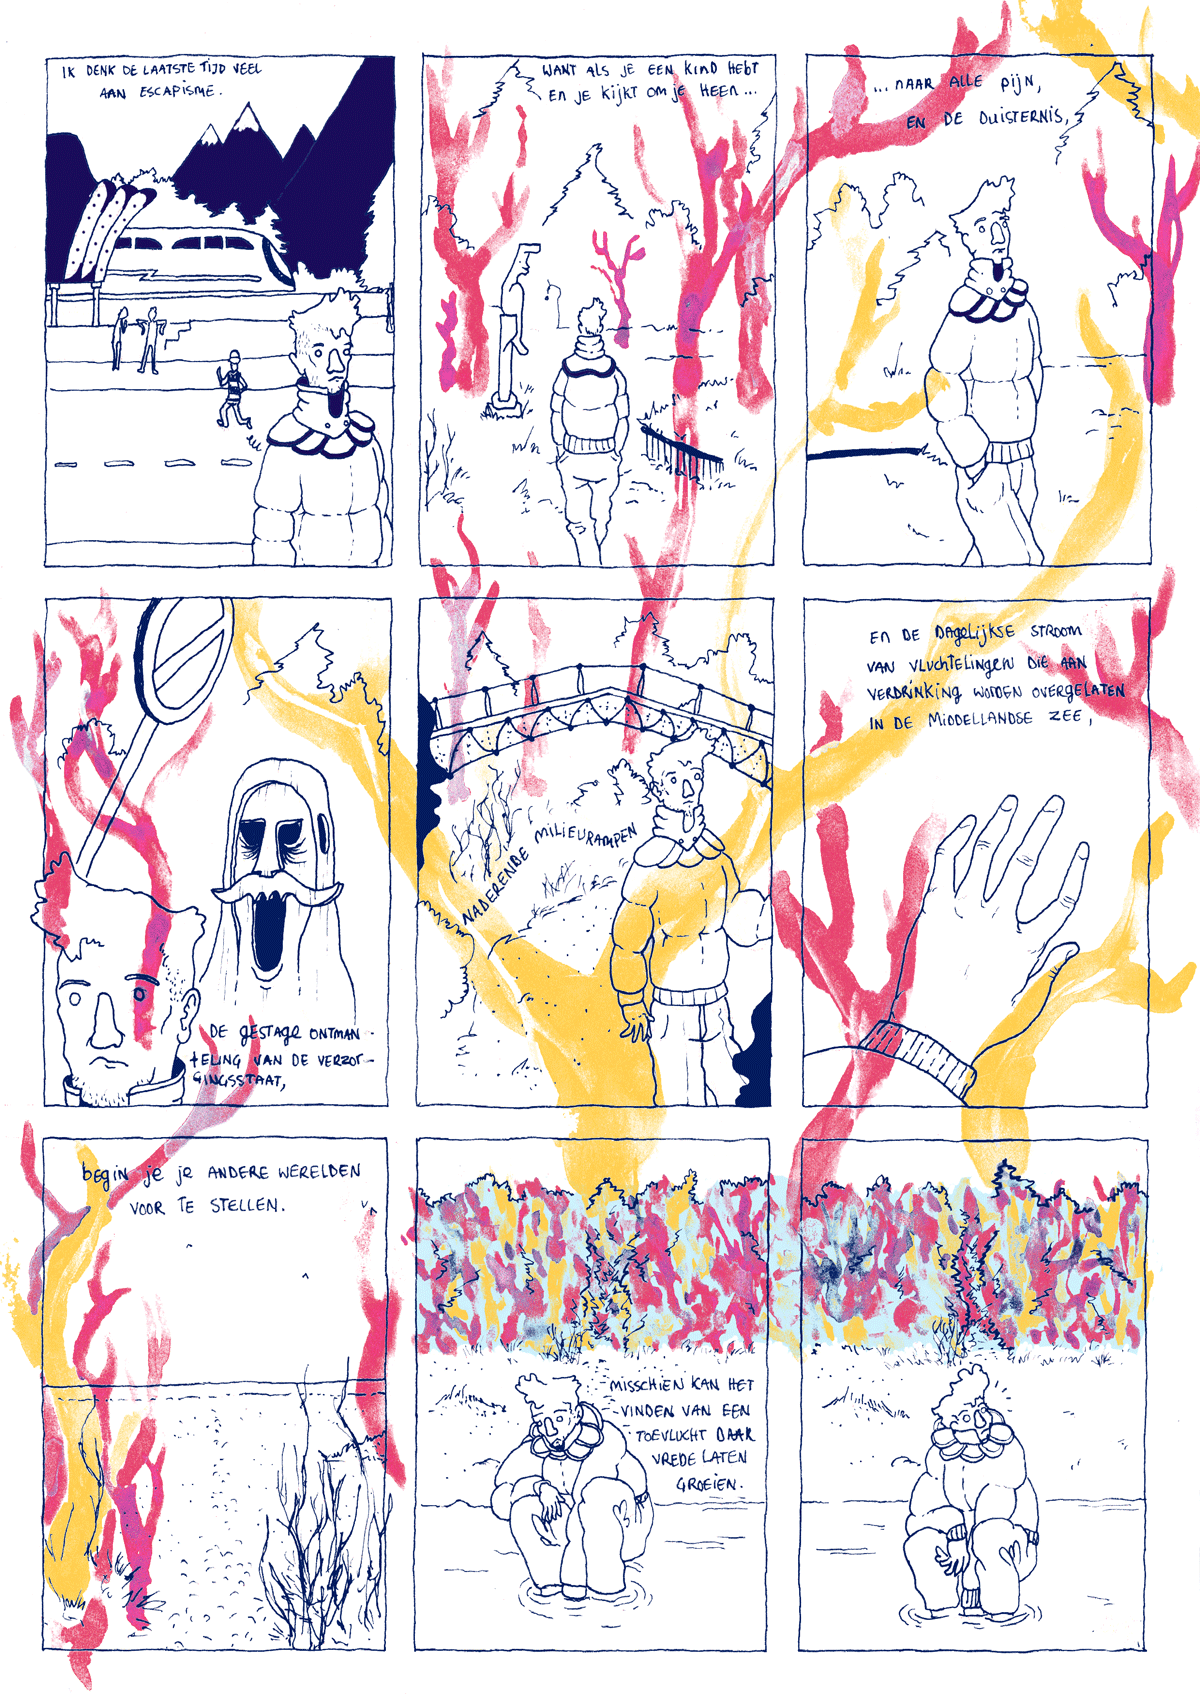 Cimedart-Short-pg.1.png